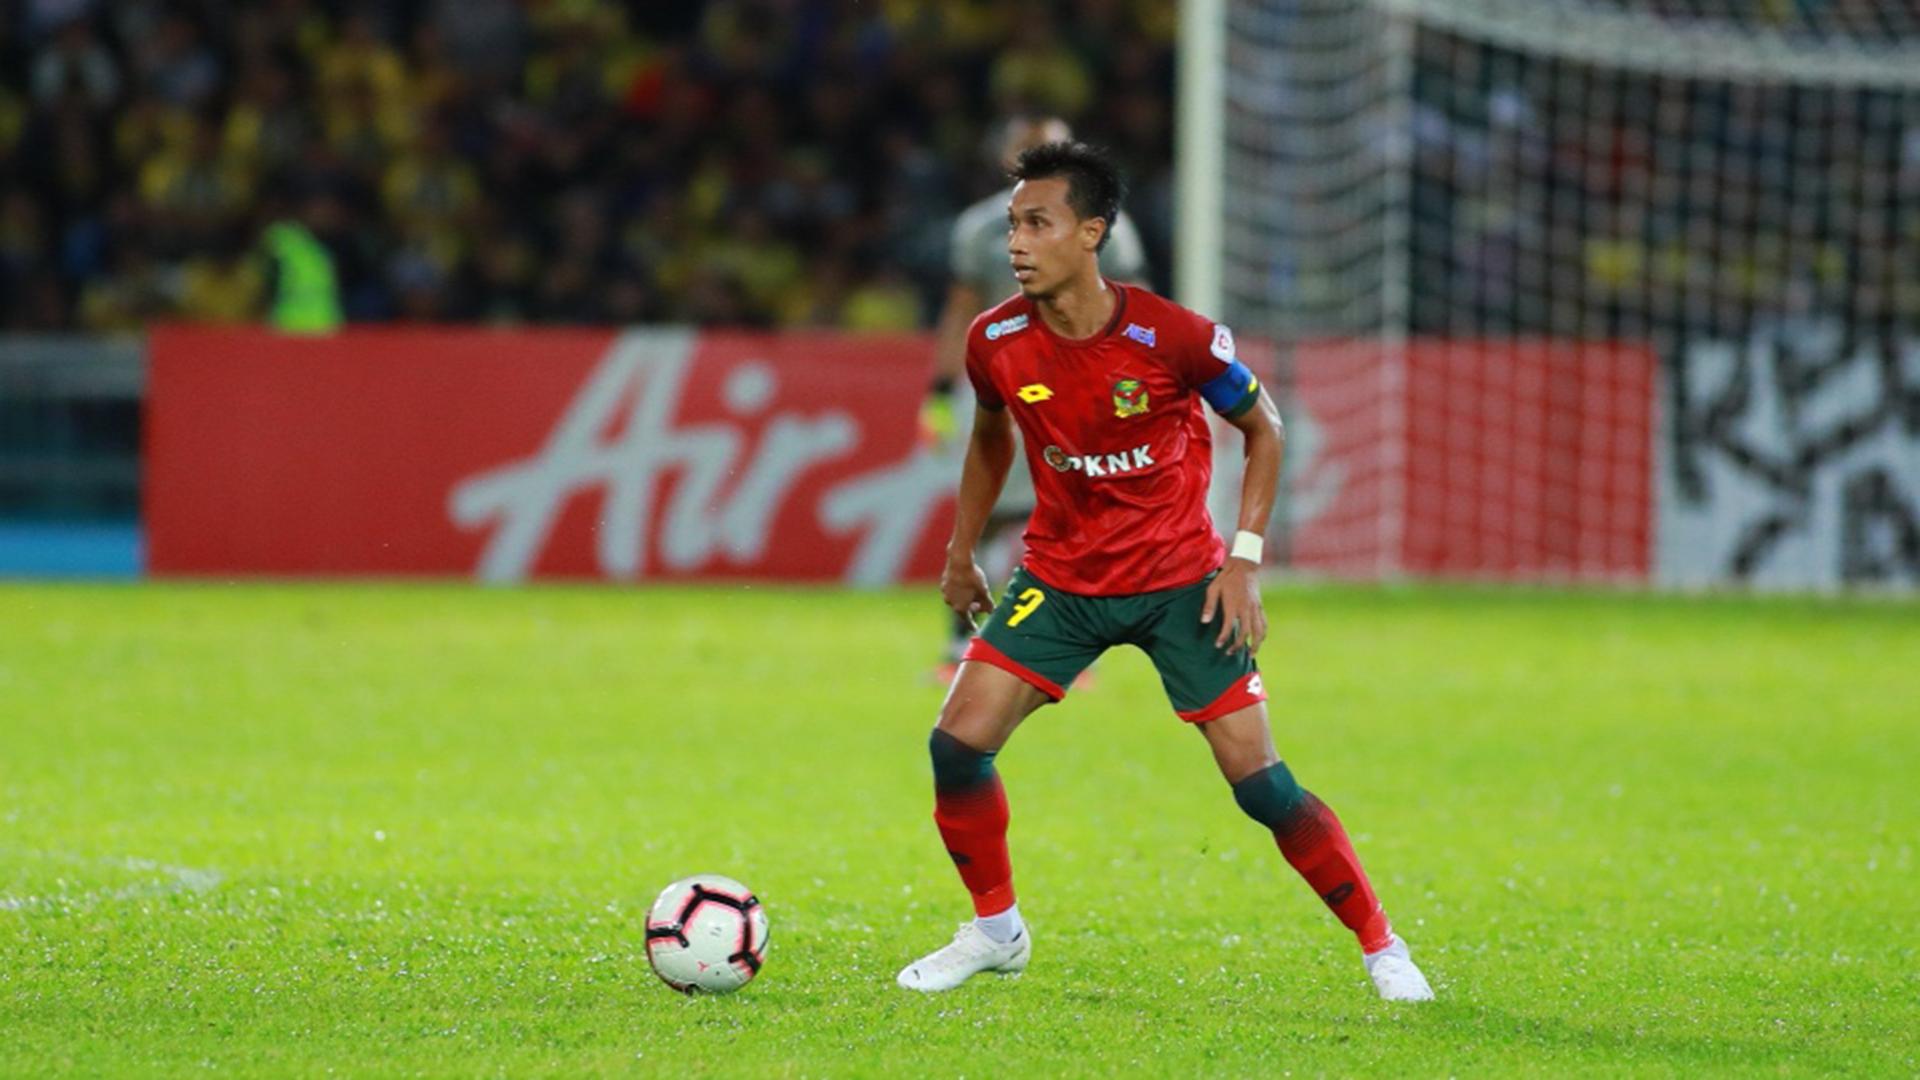 Baddrol Bakhtiar, Pahang v Kedah, Malaysia Cup, 26 Oct 2019